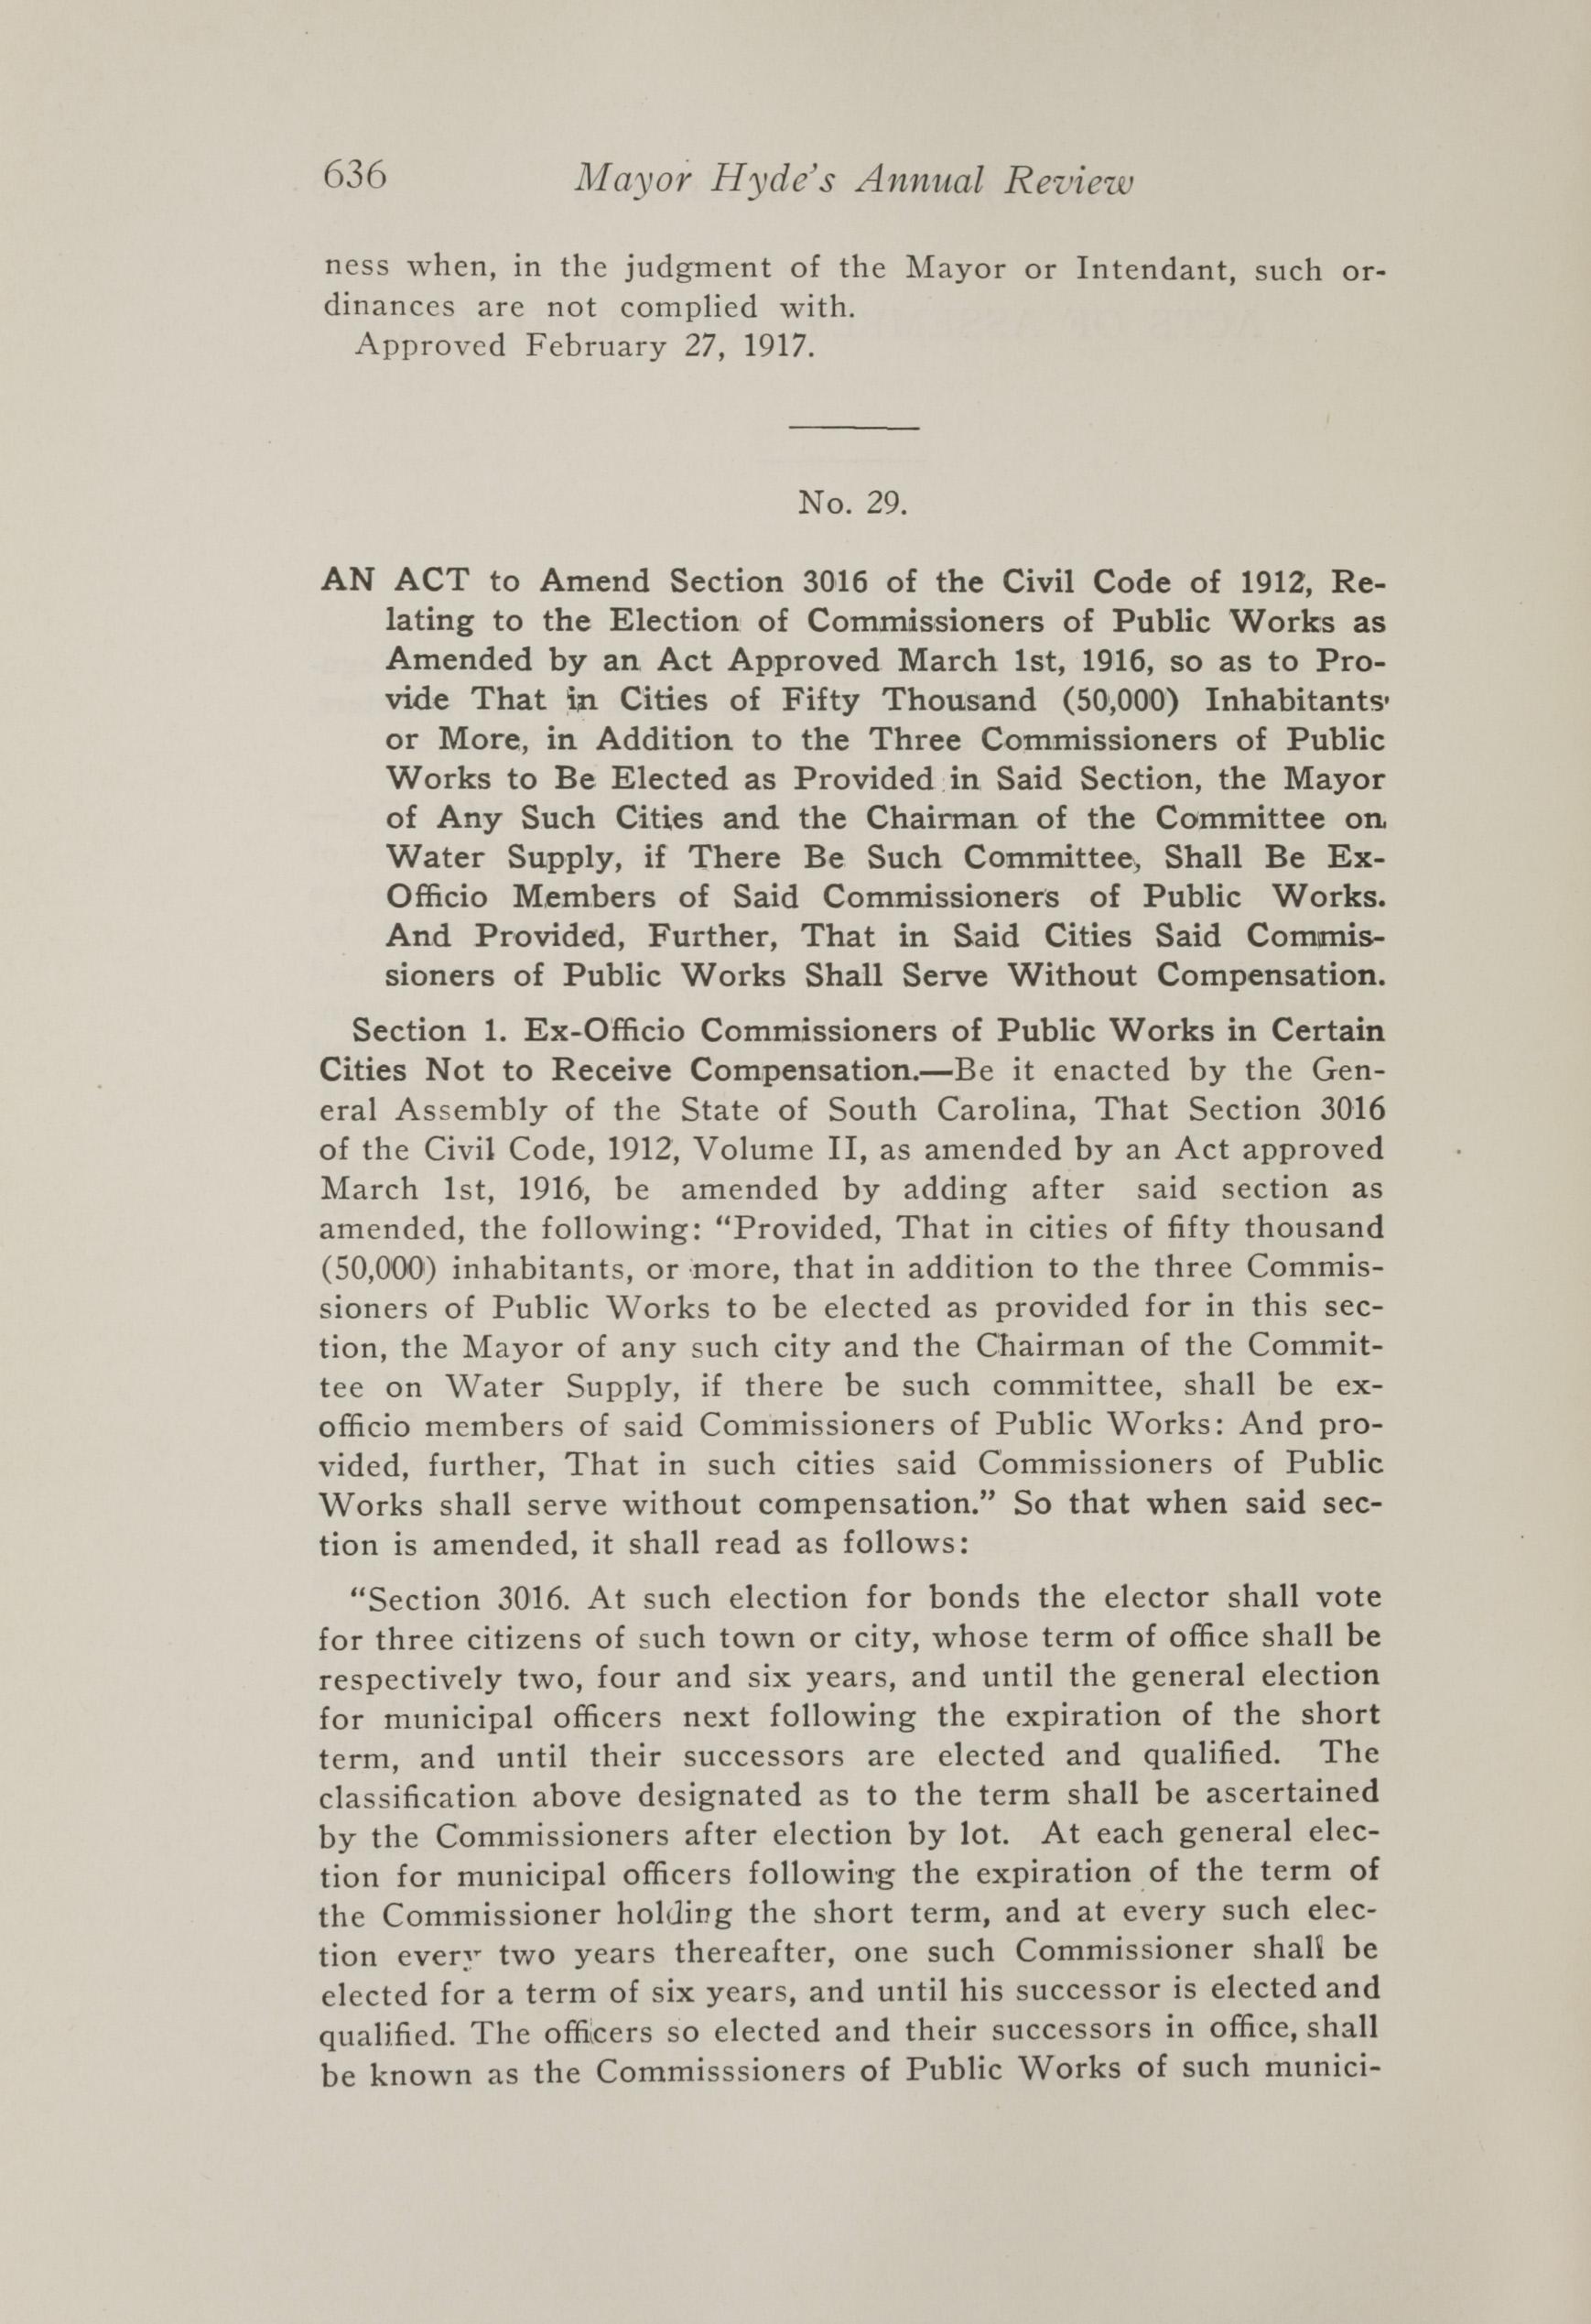 Charleston Yearbook, 1917, page 636